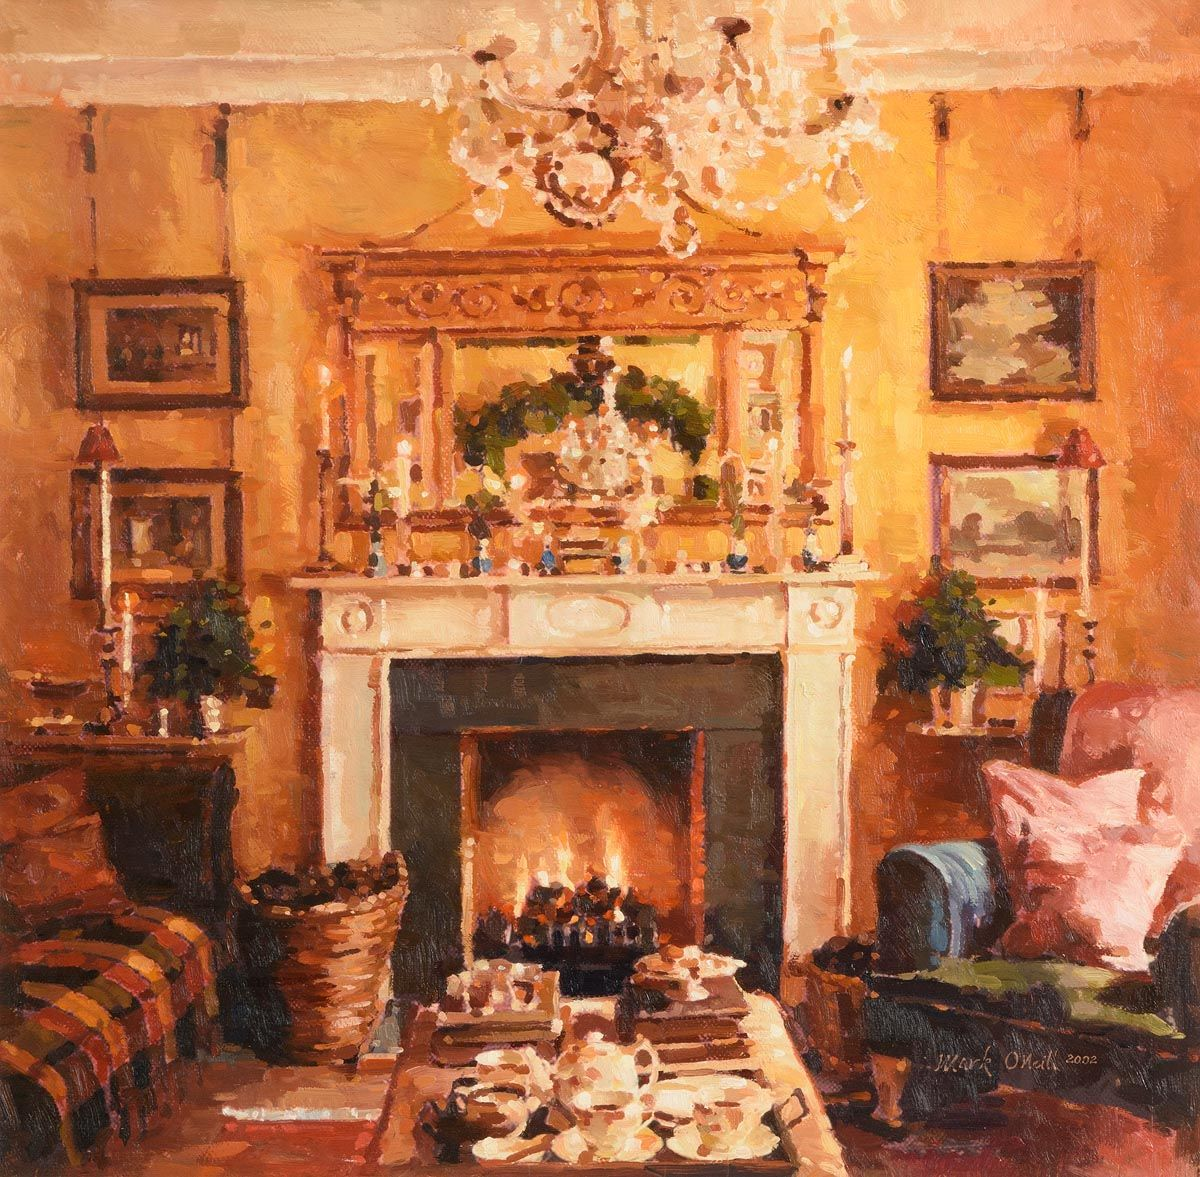 Mark O'Neill, Festive Drawing Room (2002) at Morgan O'Driscoll Art Auctions